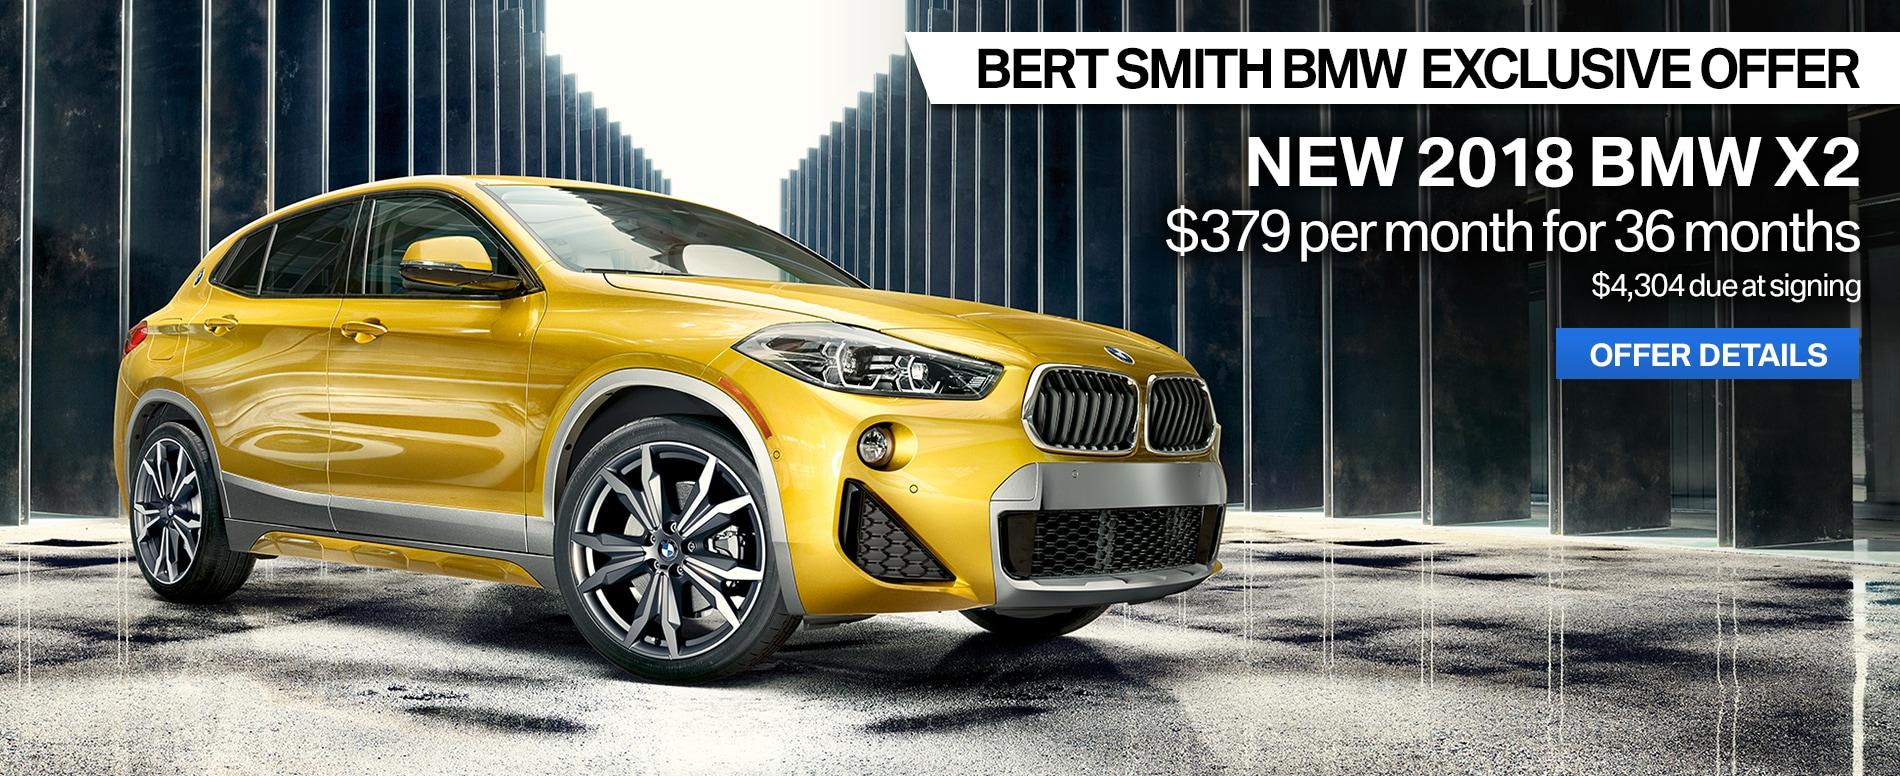 new bmw used car dealer in saint petersburg fl bert smith bmw. Black Bedroom Furniture Sets. Home Design Ideas